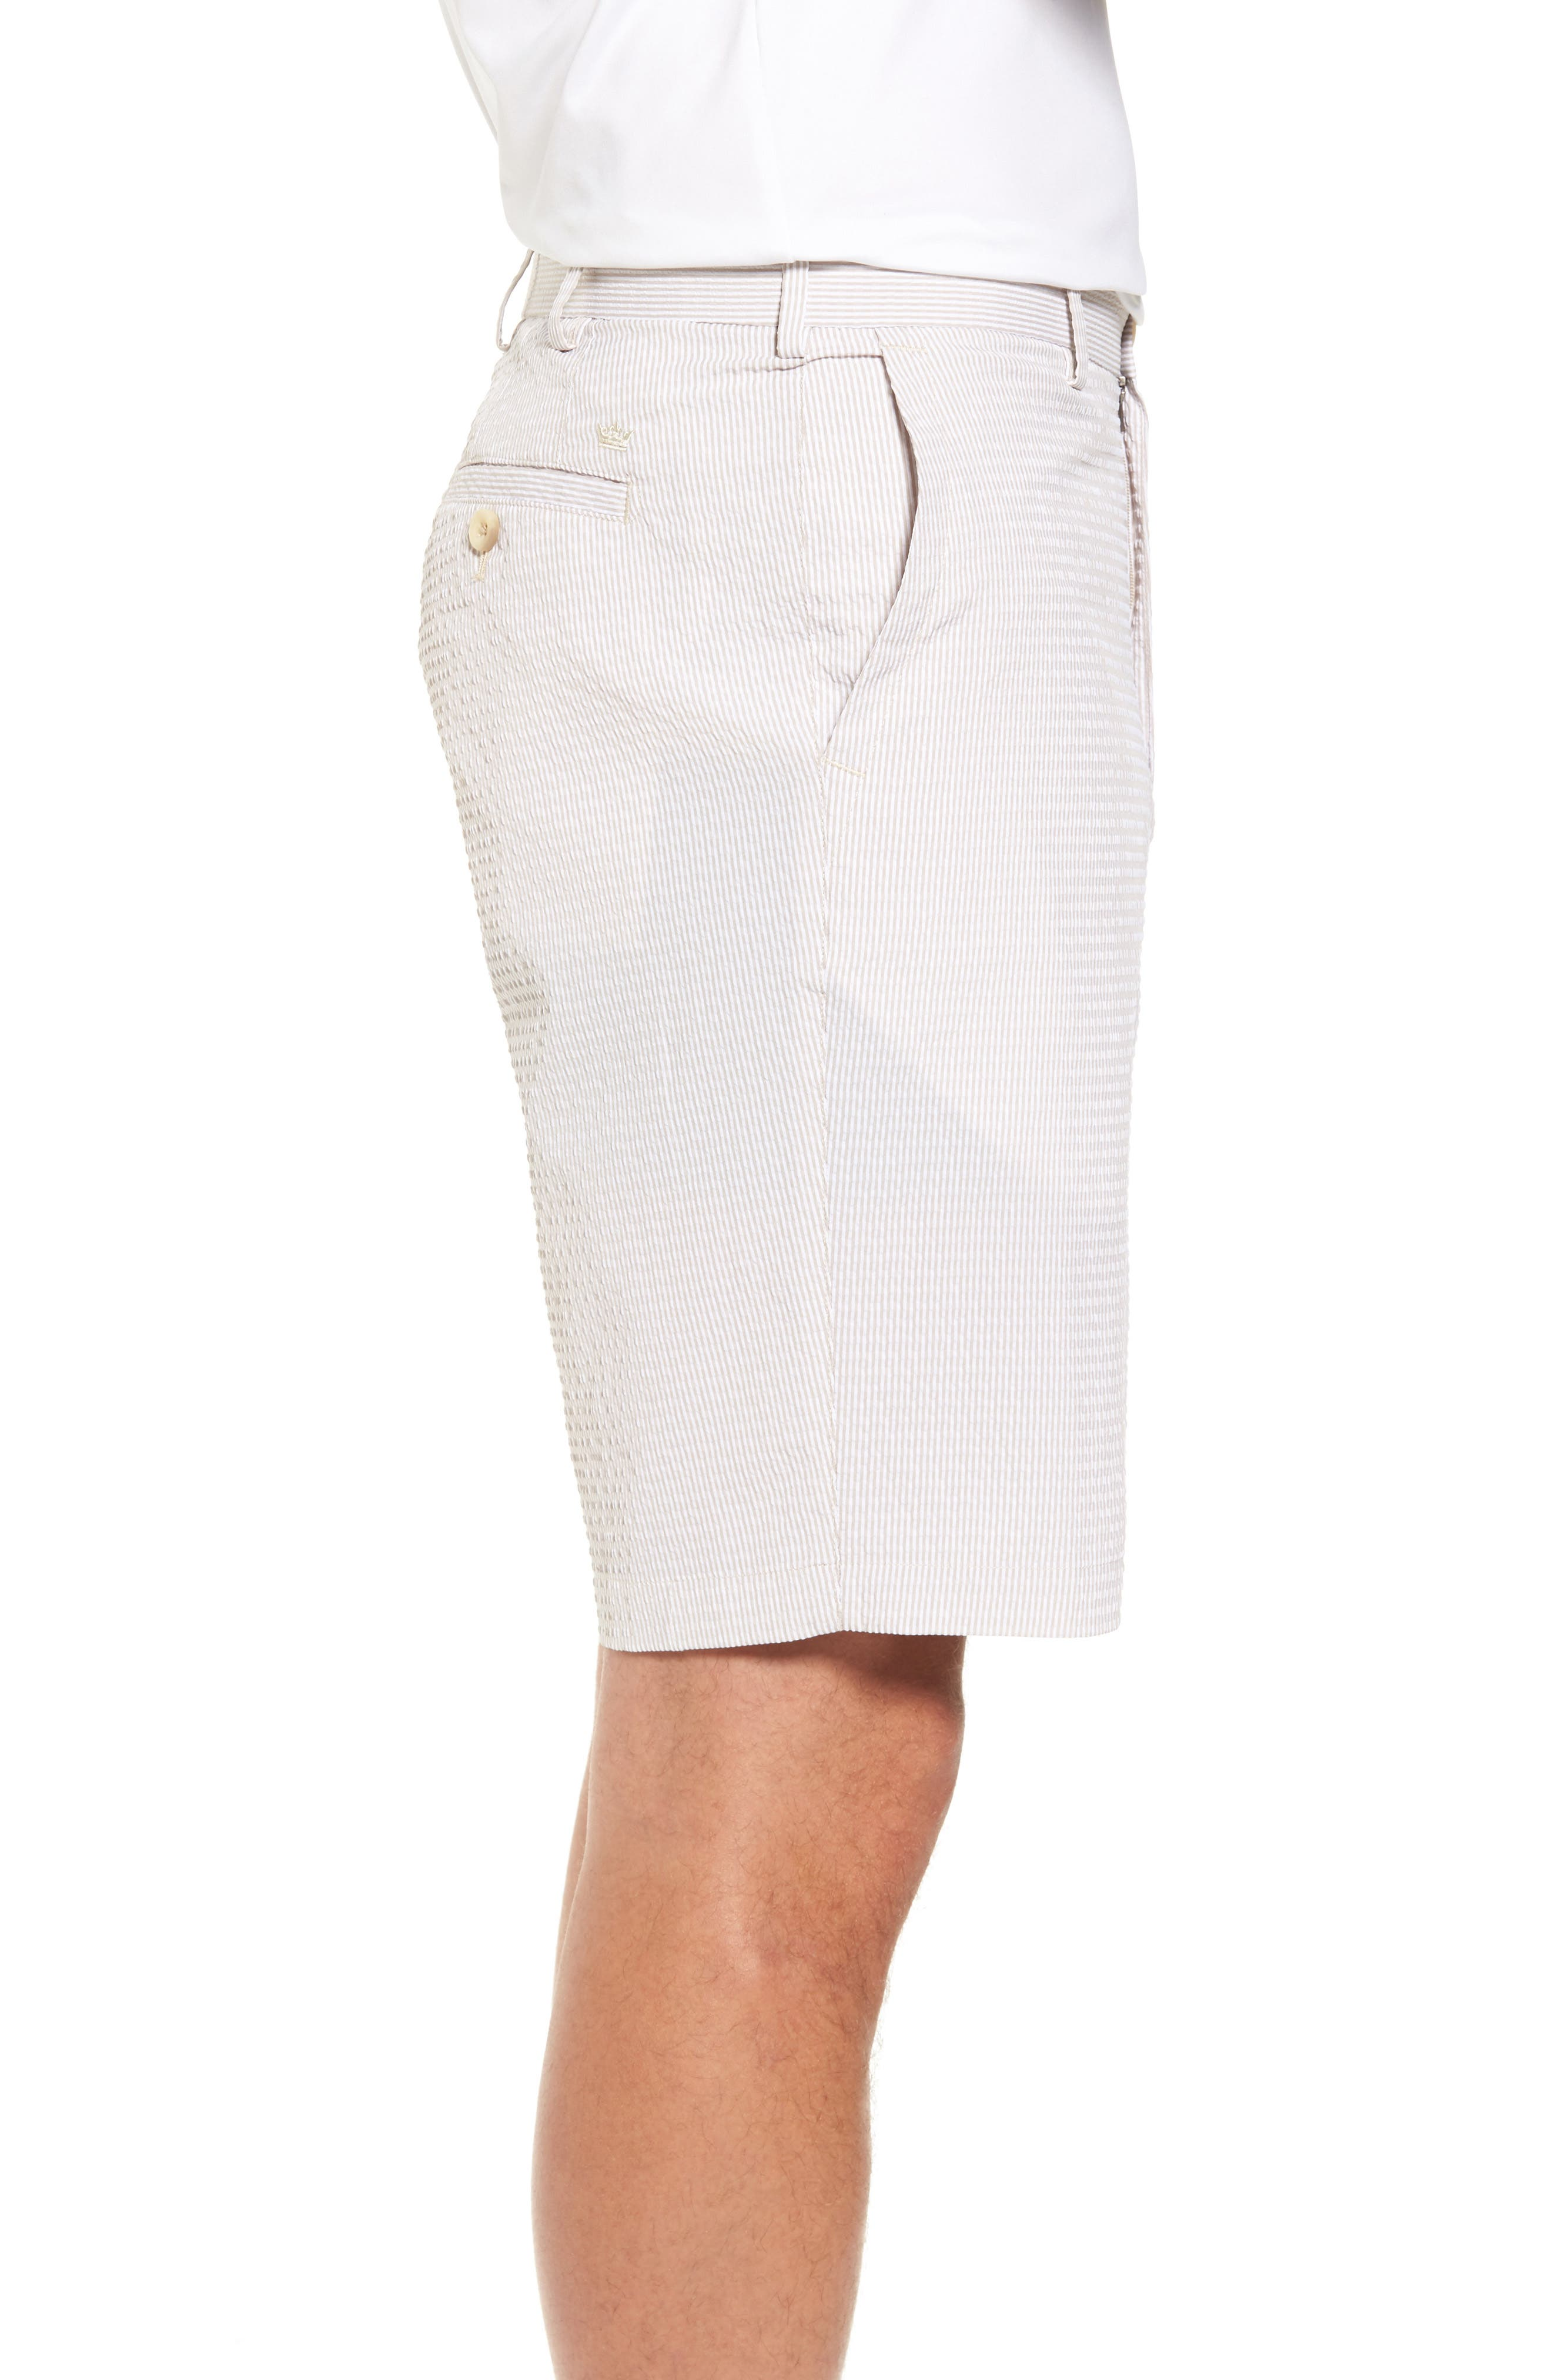 Apex Pinstripe Seersucker Shorts,                             Alternate thumbnail 3, color,                             Khaki